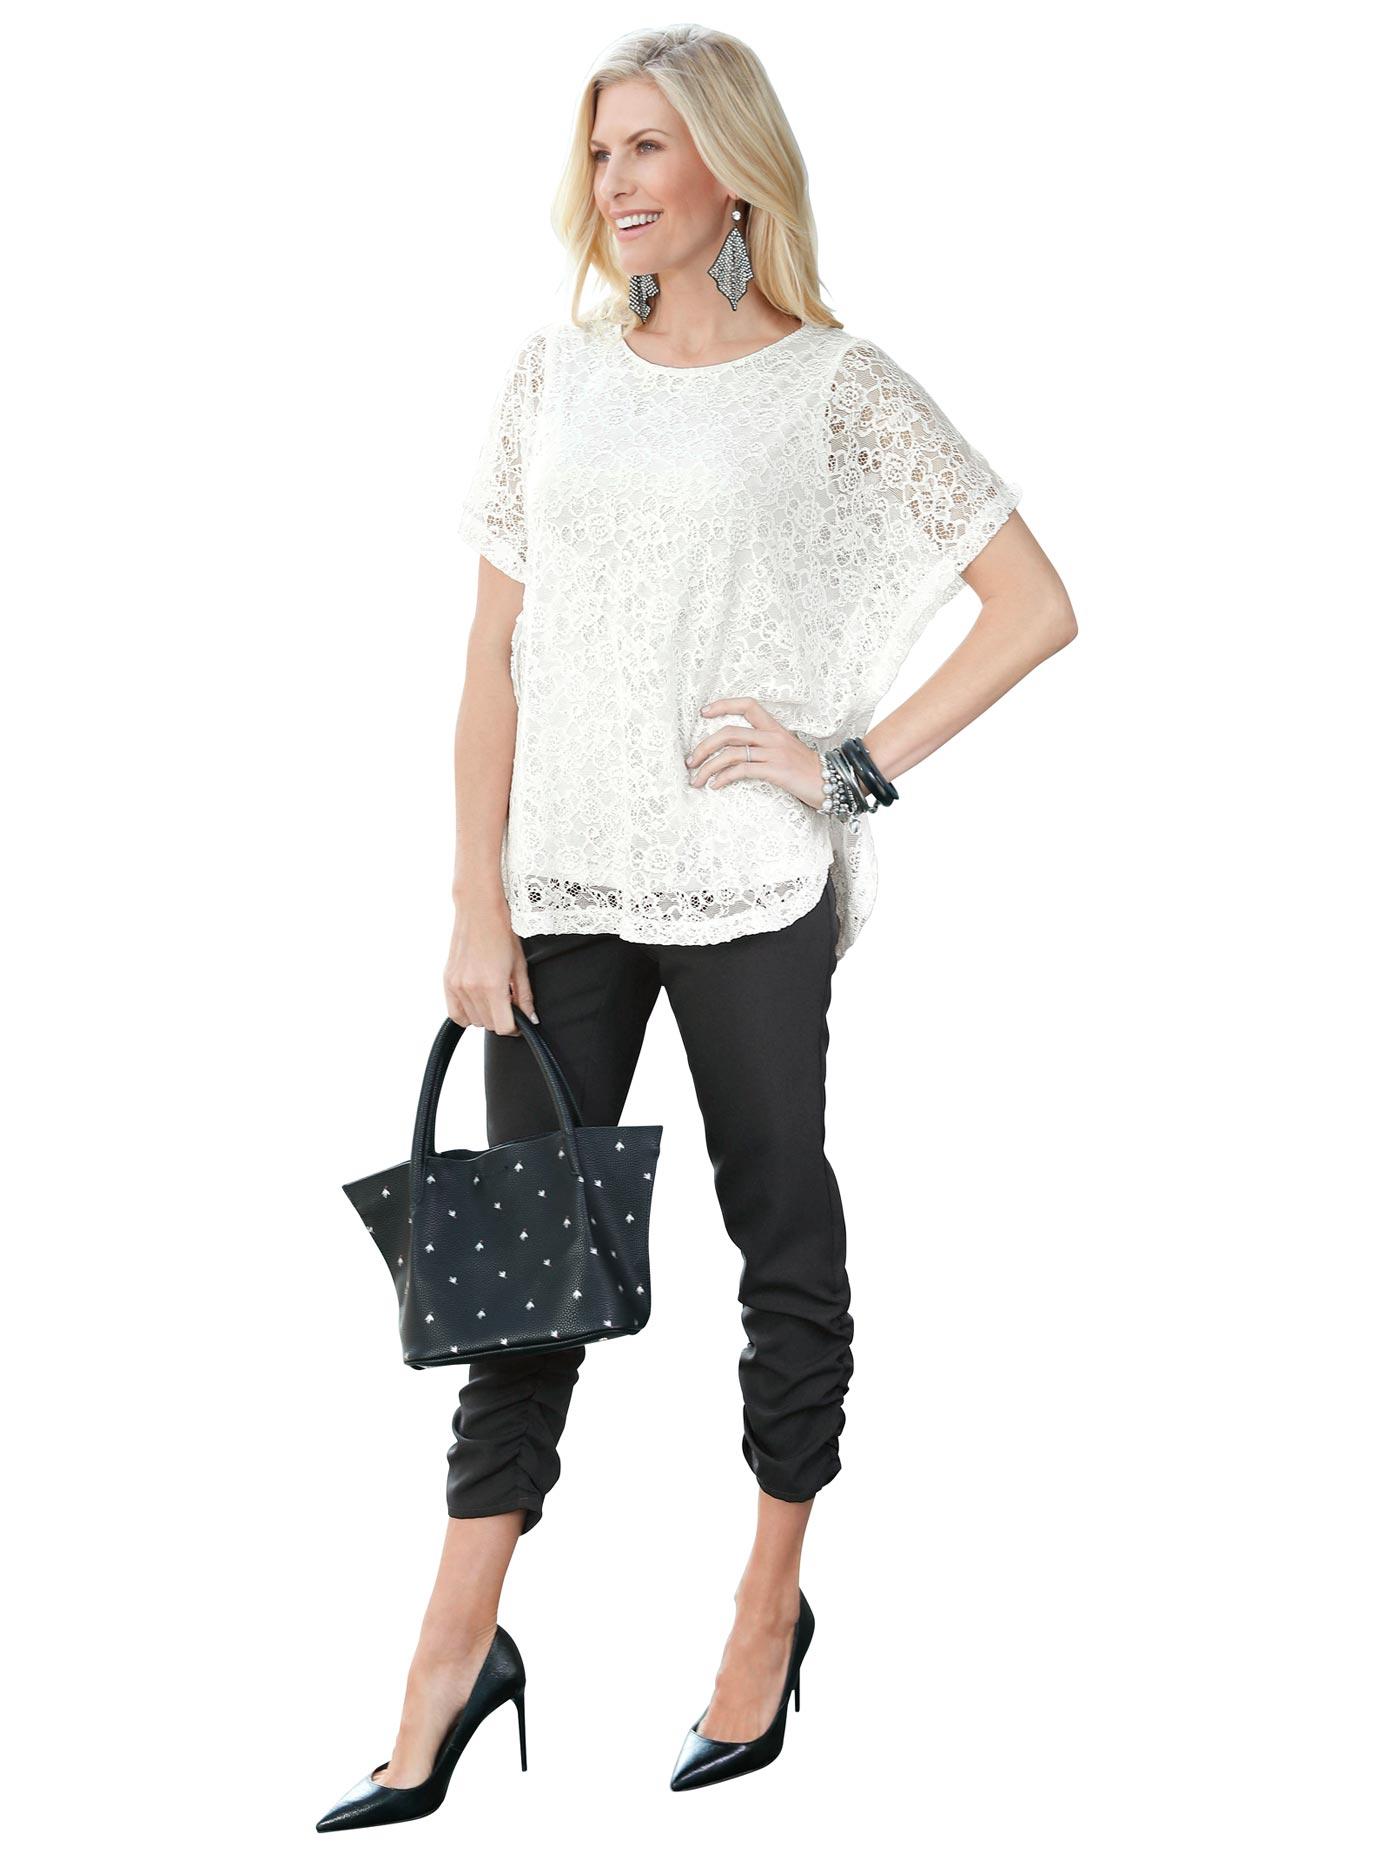 Classic Basics Tunikashirt aus floraler transparenter Spitze | Bekleidung > Shirts > Tunikashirts | Classic Basics